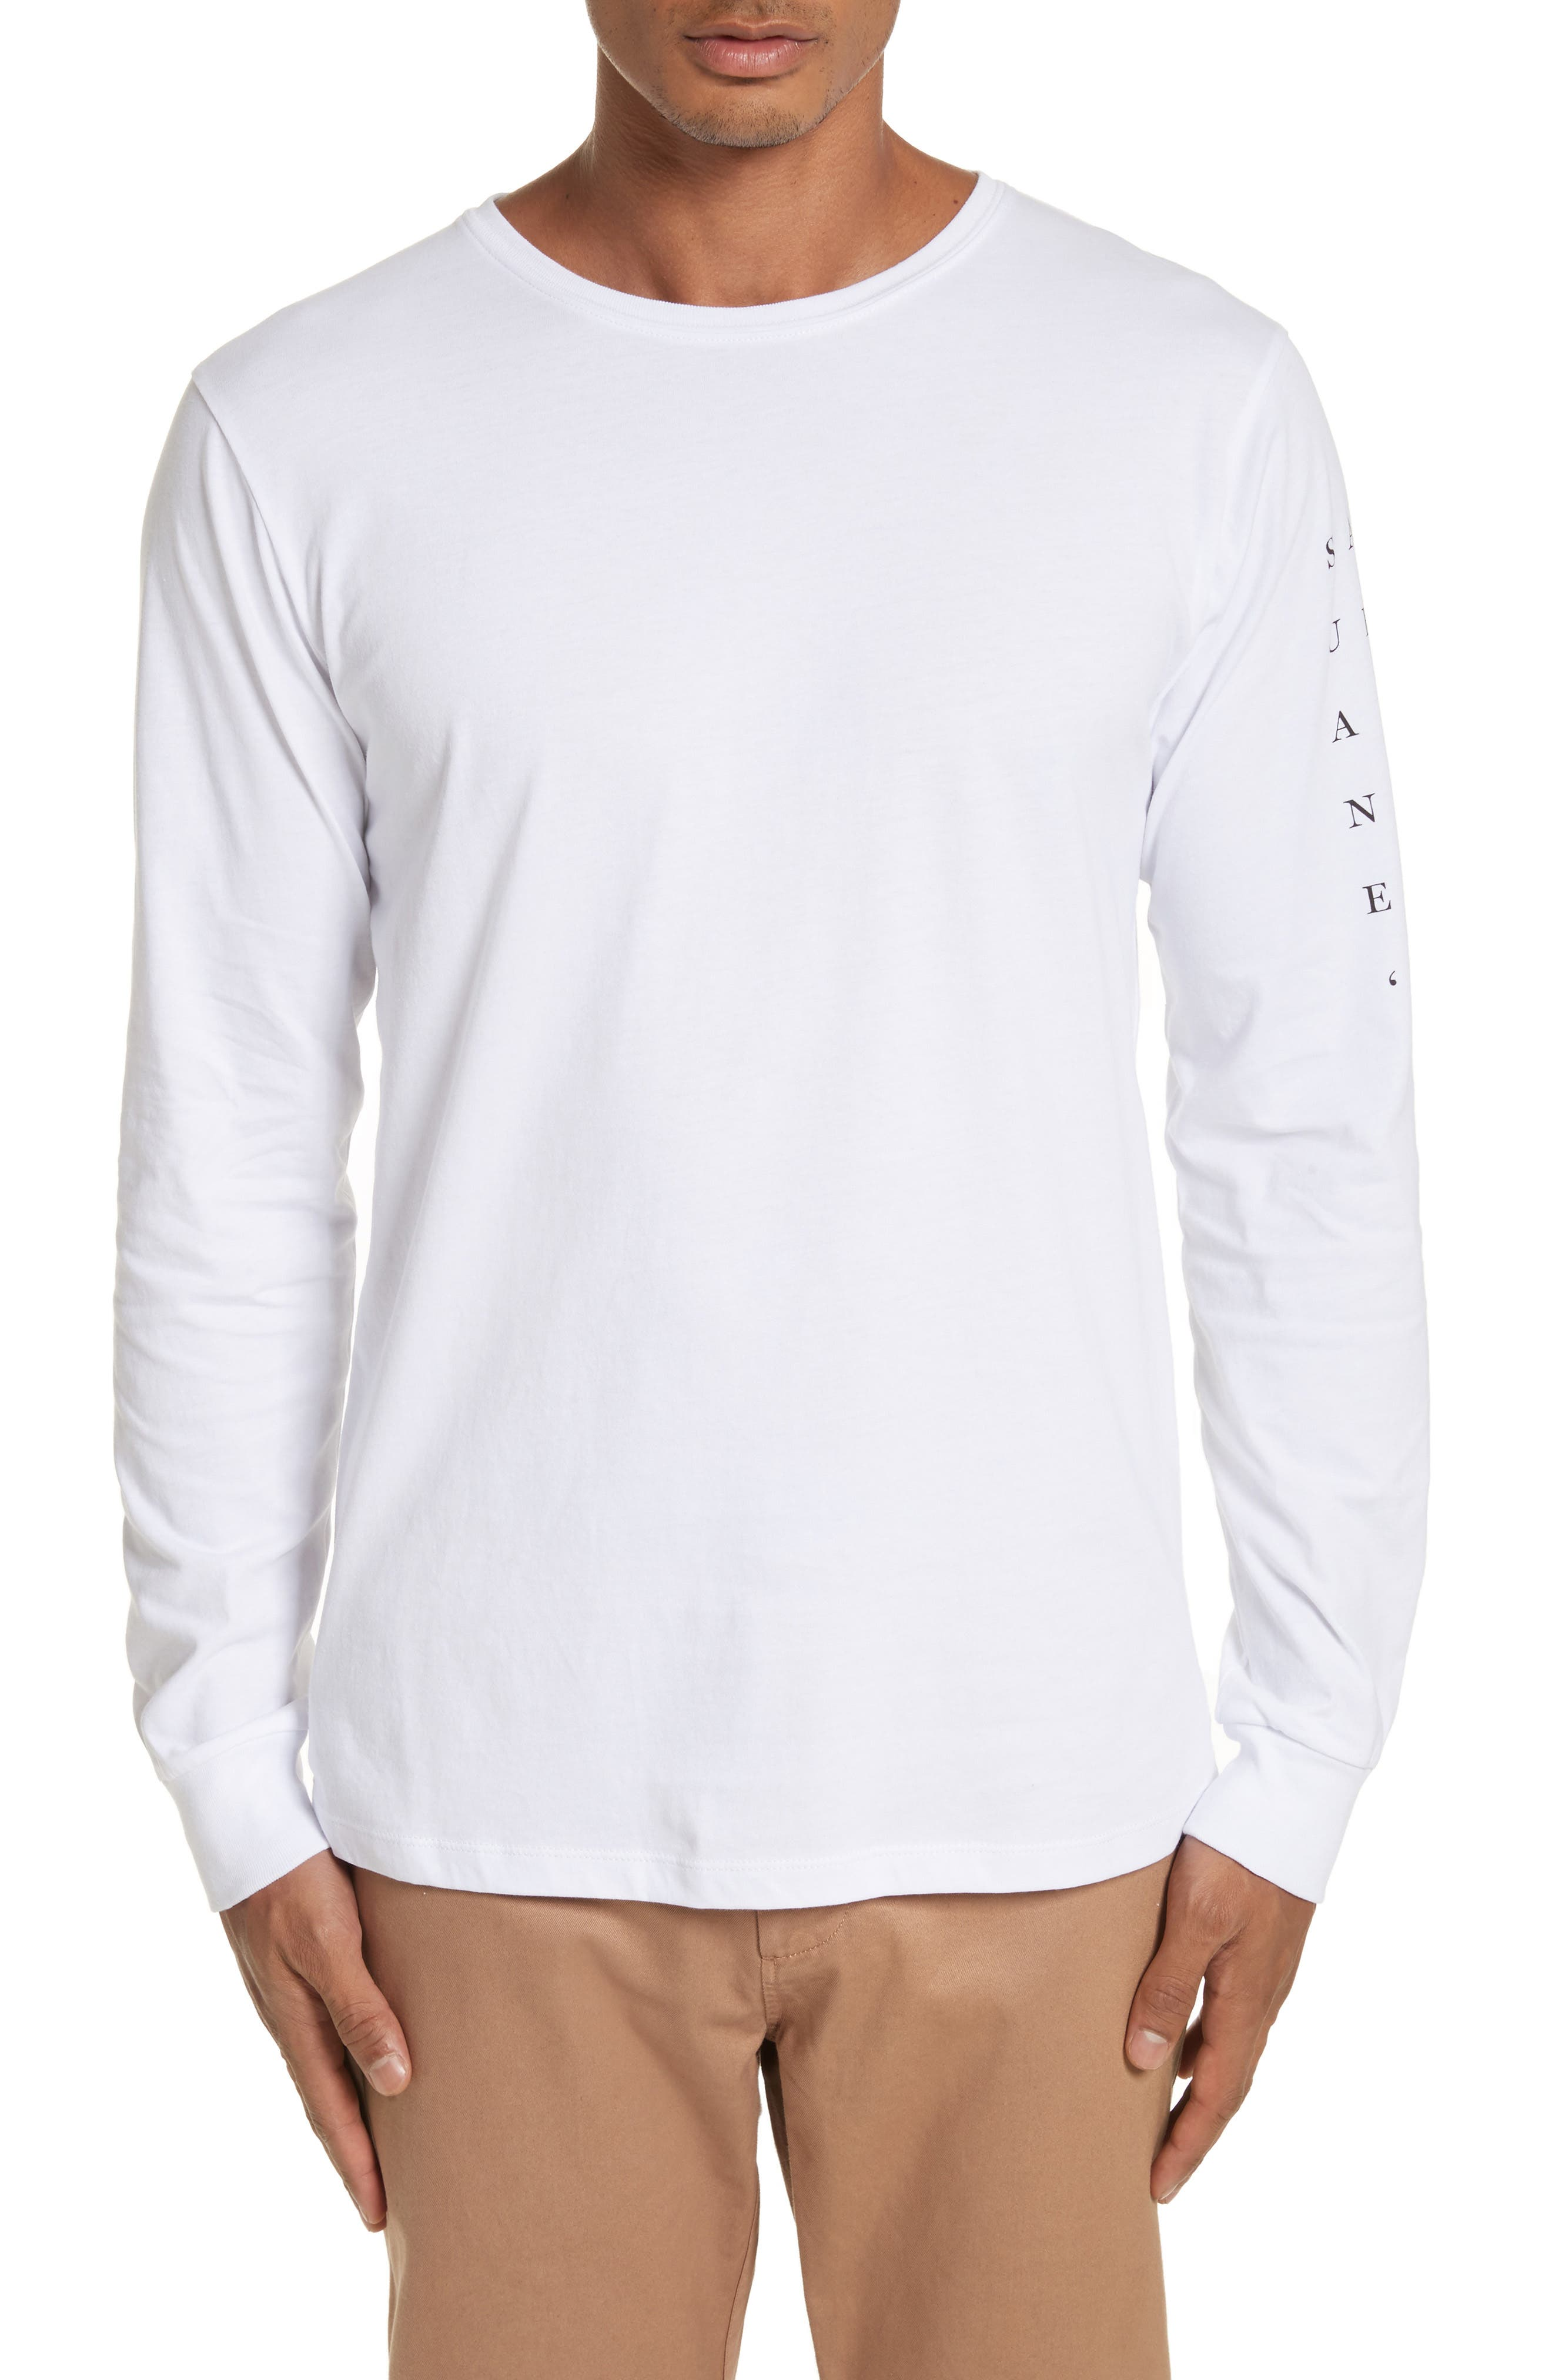 Main Image - Saturdays NYC Stacked Logo Graphic Long Sleeve T-Shirt